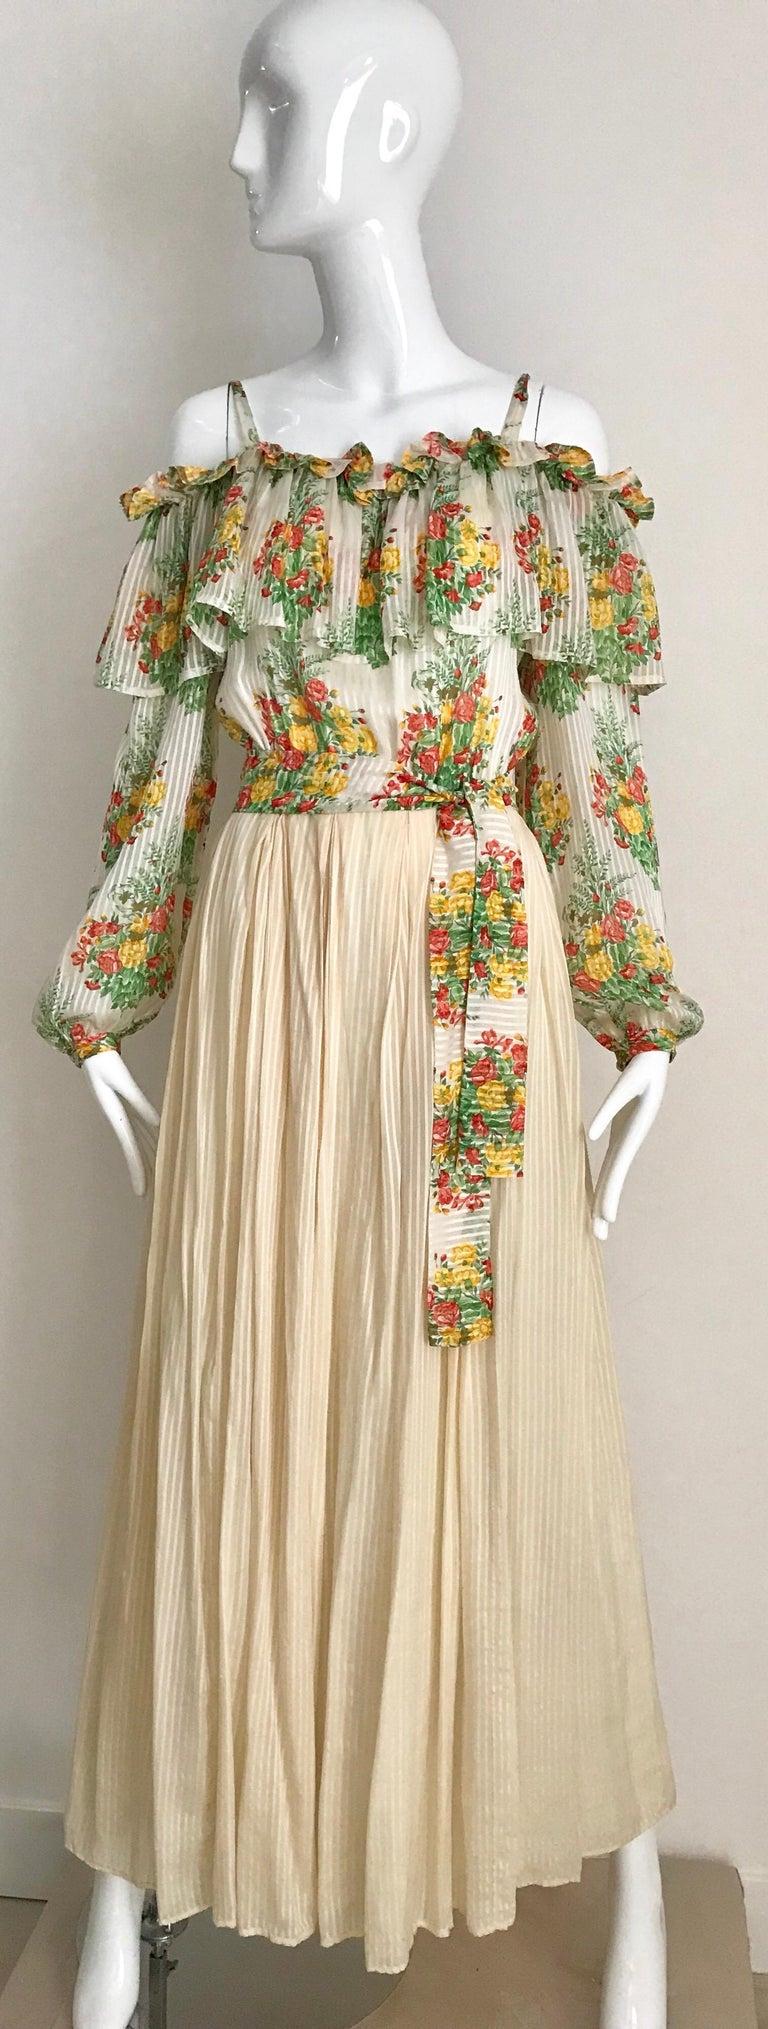 Beige Andre Laug Creme Silk Floral Print Maxi Dress, 1970s  For Sale